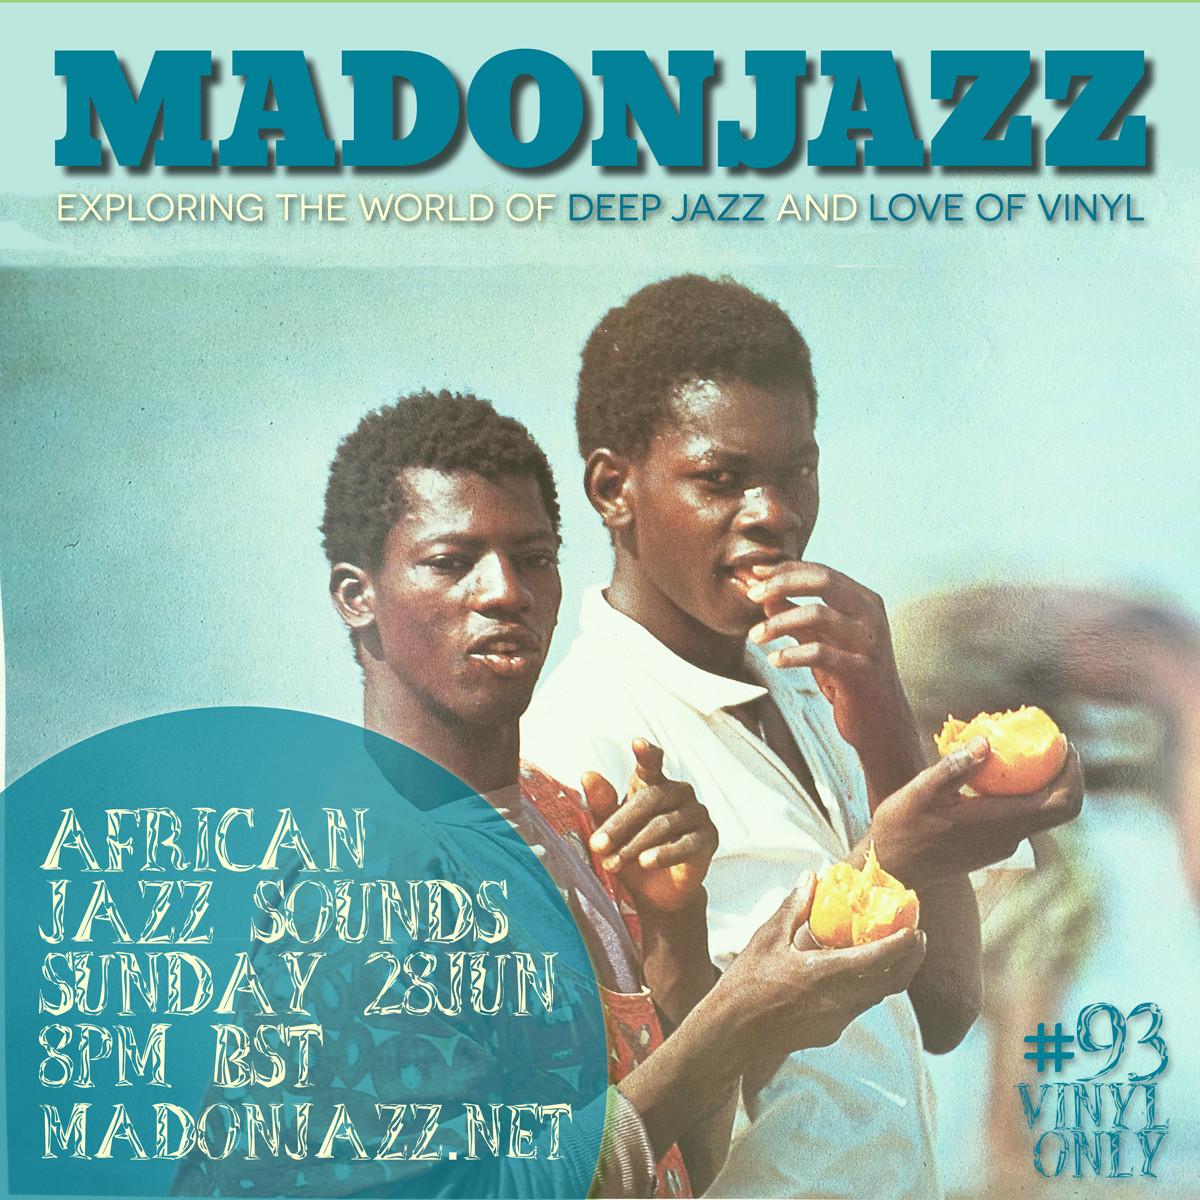 MADONJAZZ #93 – African Jazz Sounds